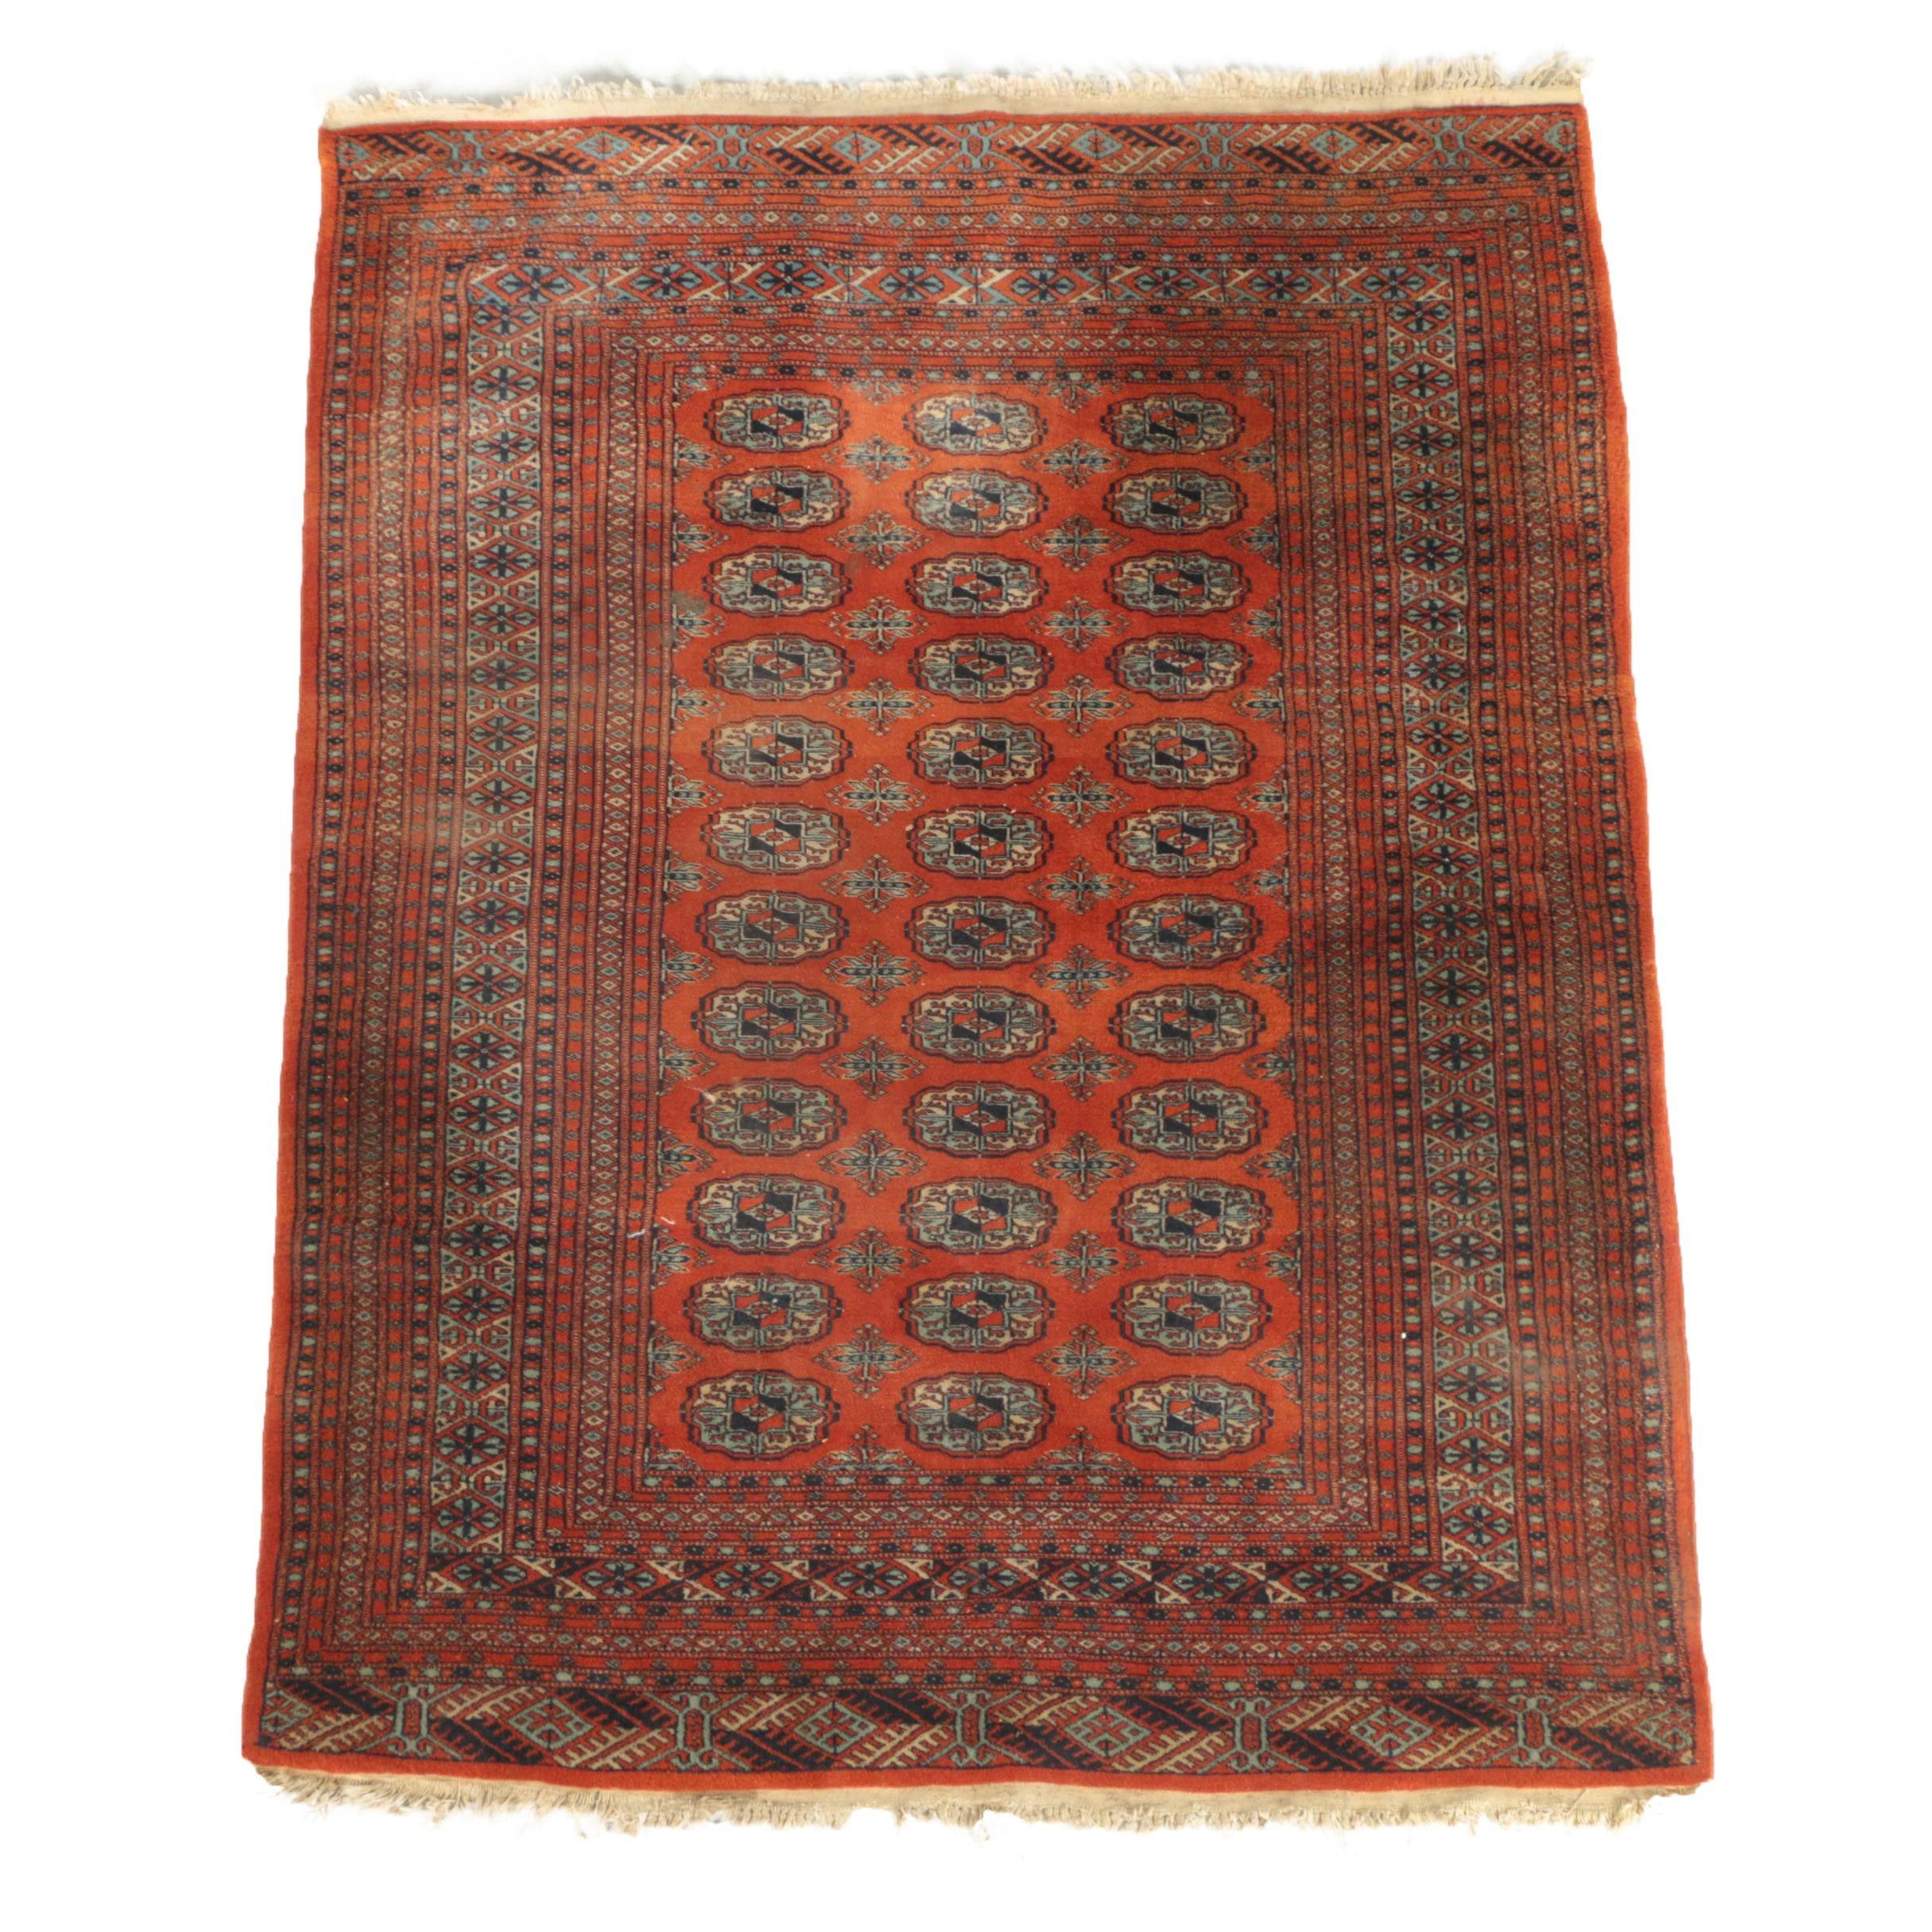 Vintage Hand-Knotted Pakistani Bokhara Area Rug